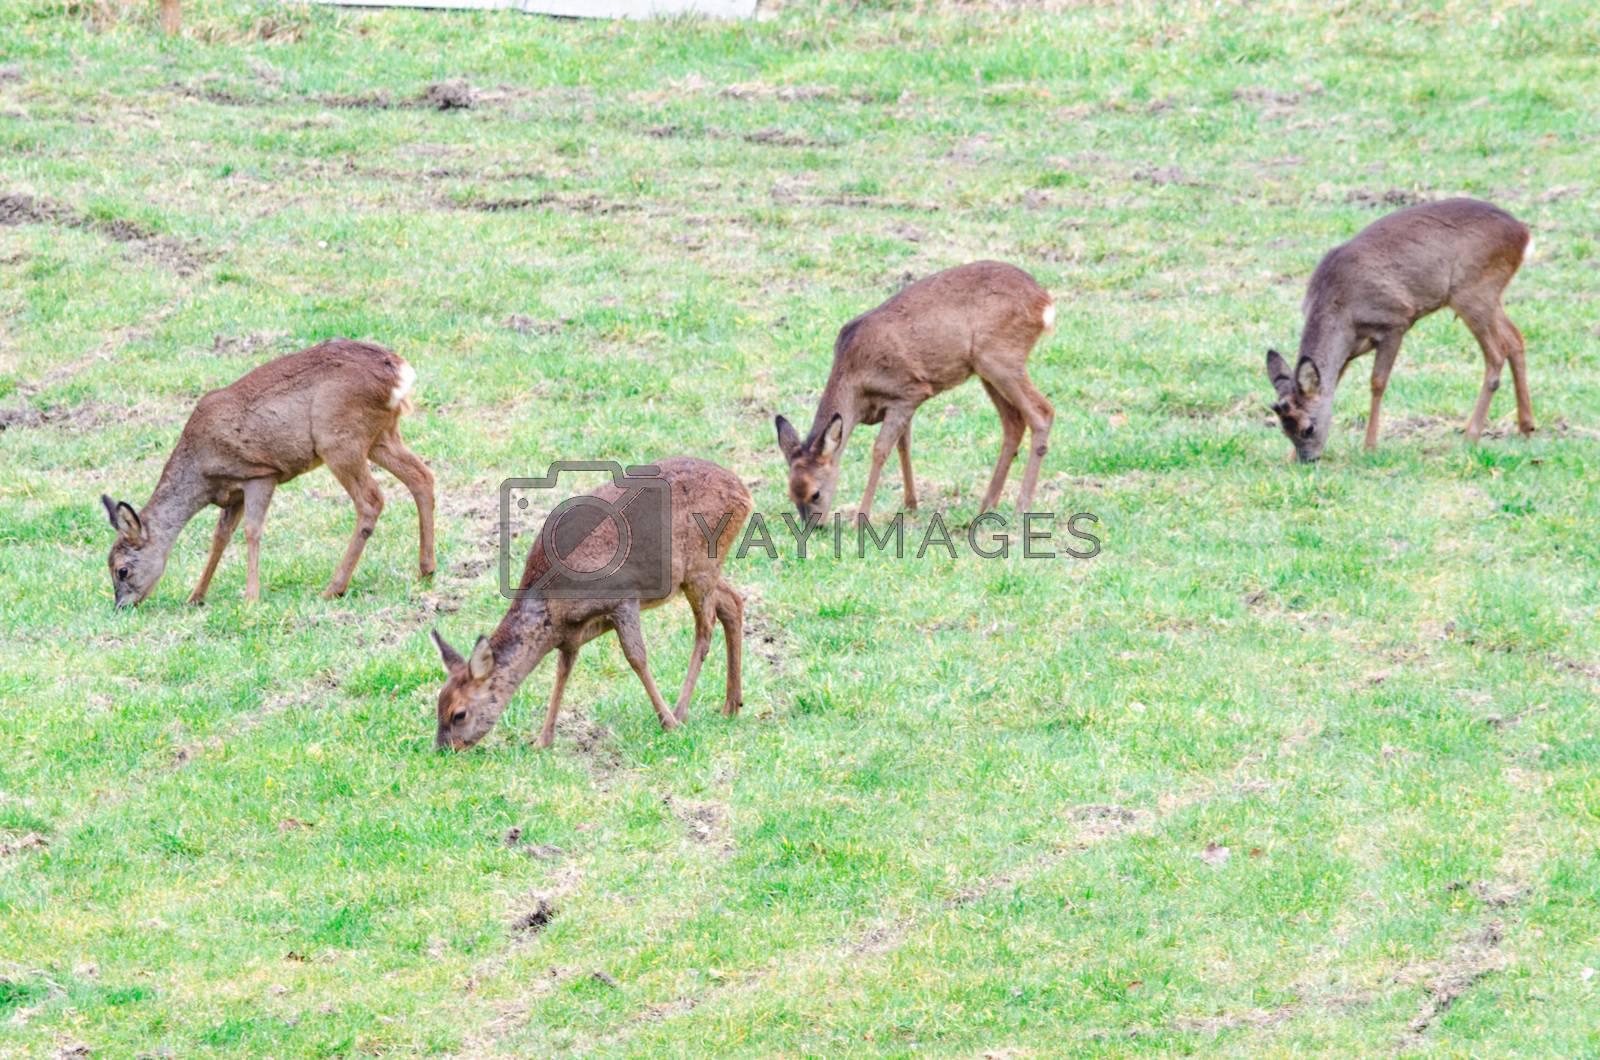 Royalty free image of  A herd of deer by JFsPic